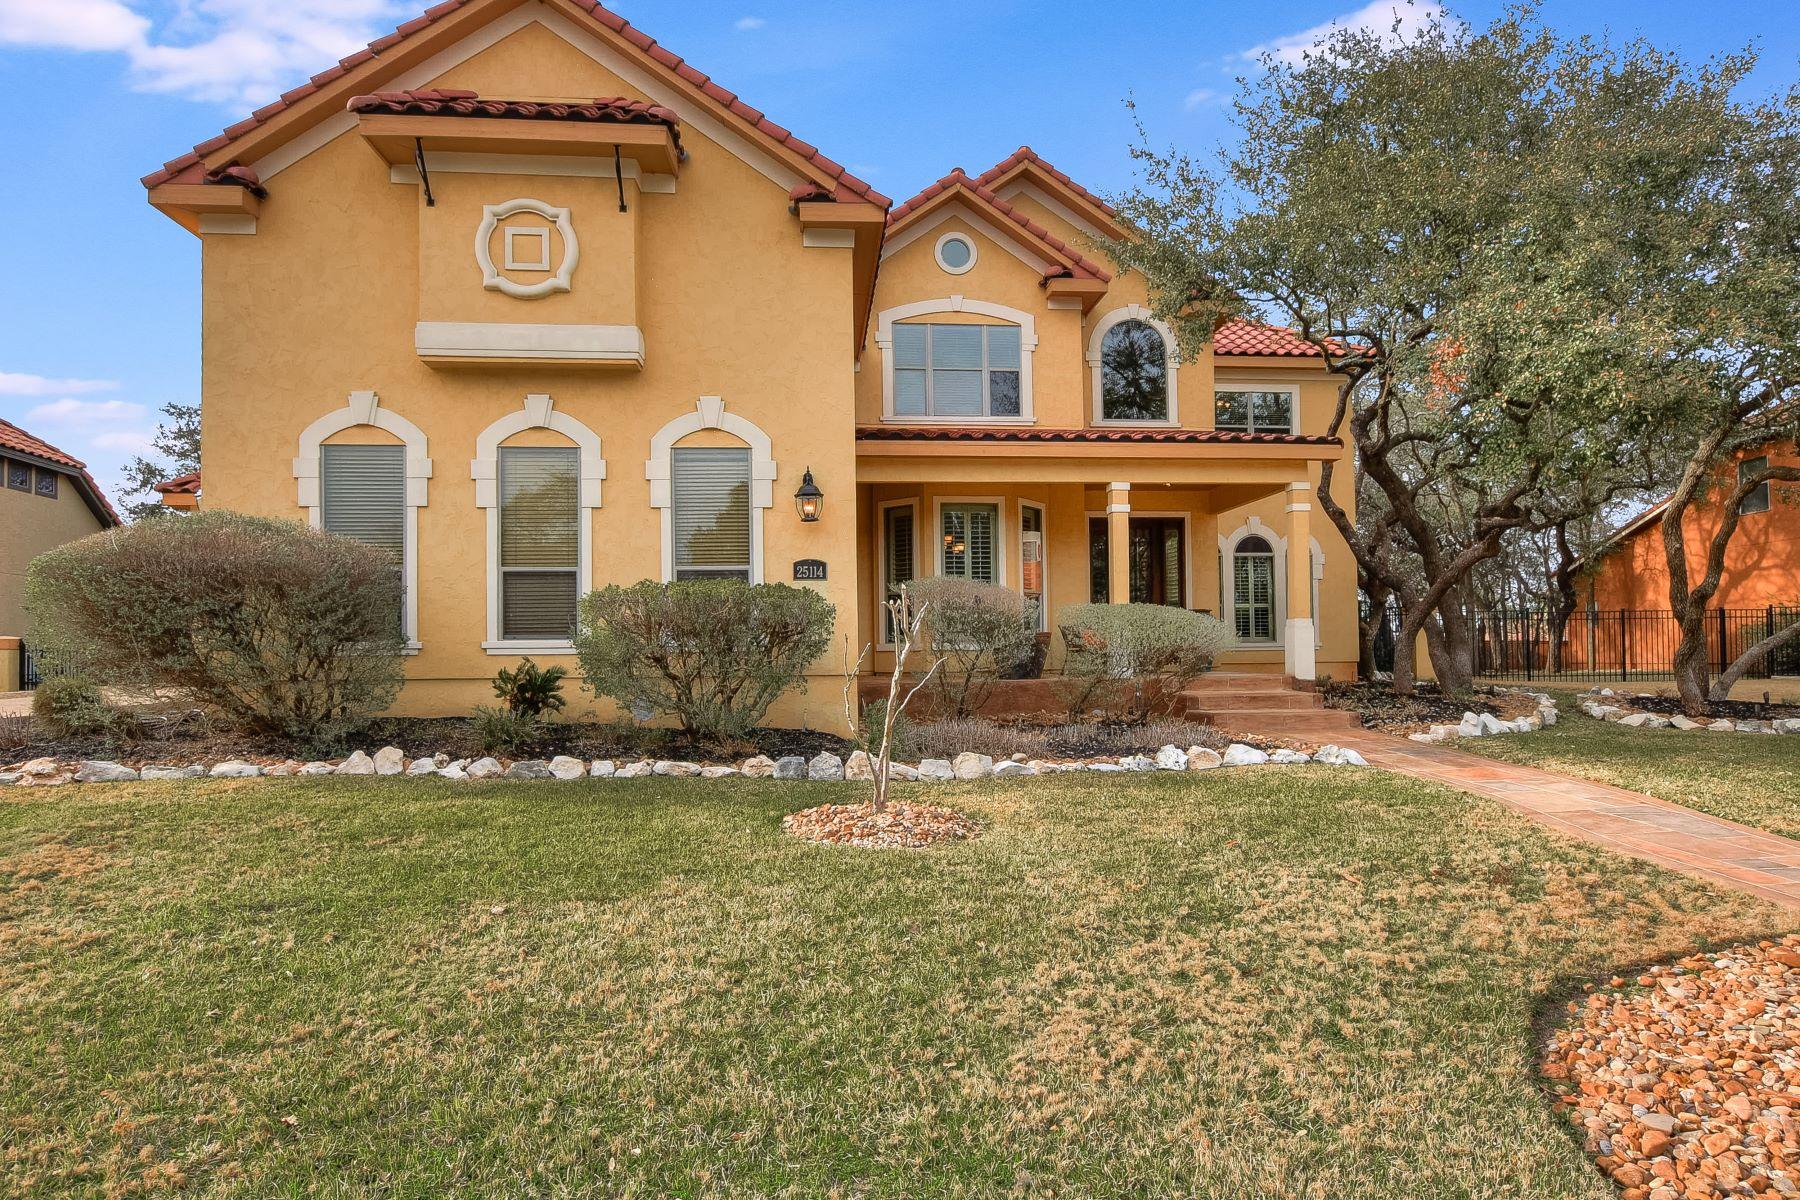 Single Family Home for Sale at Spacious Estate in Canyon Springs 25114 Fairway Springs San Antonio, Texas 78260 United States